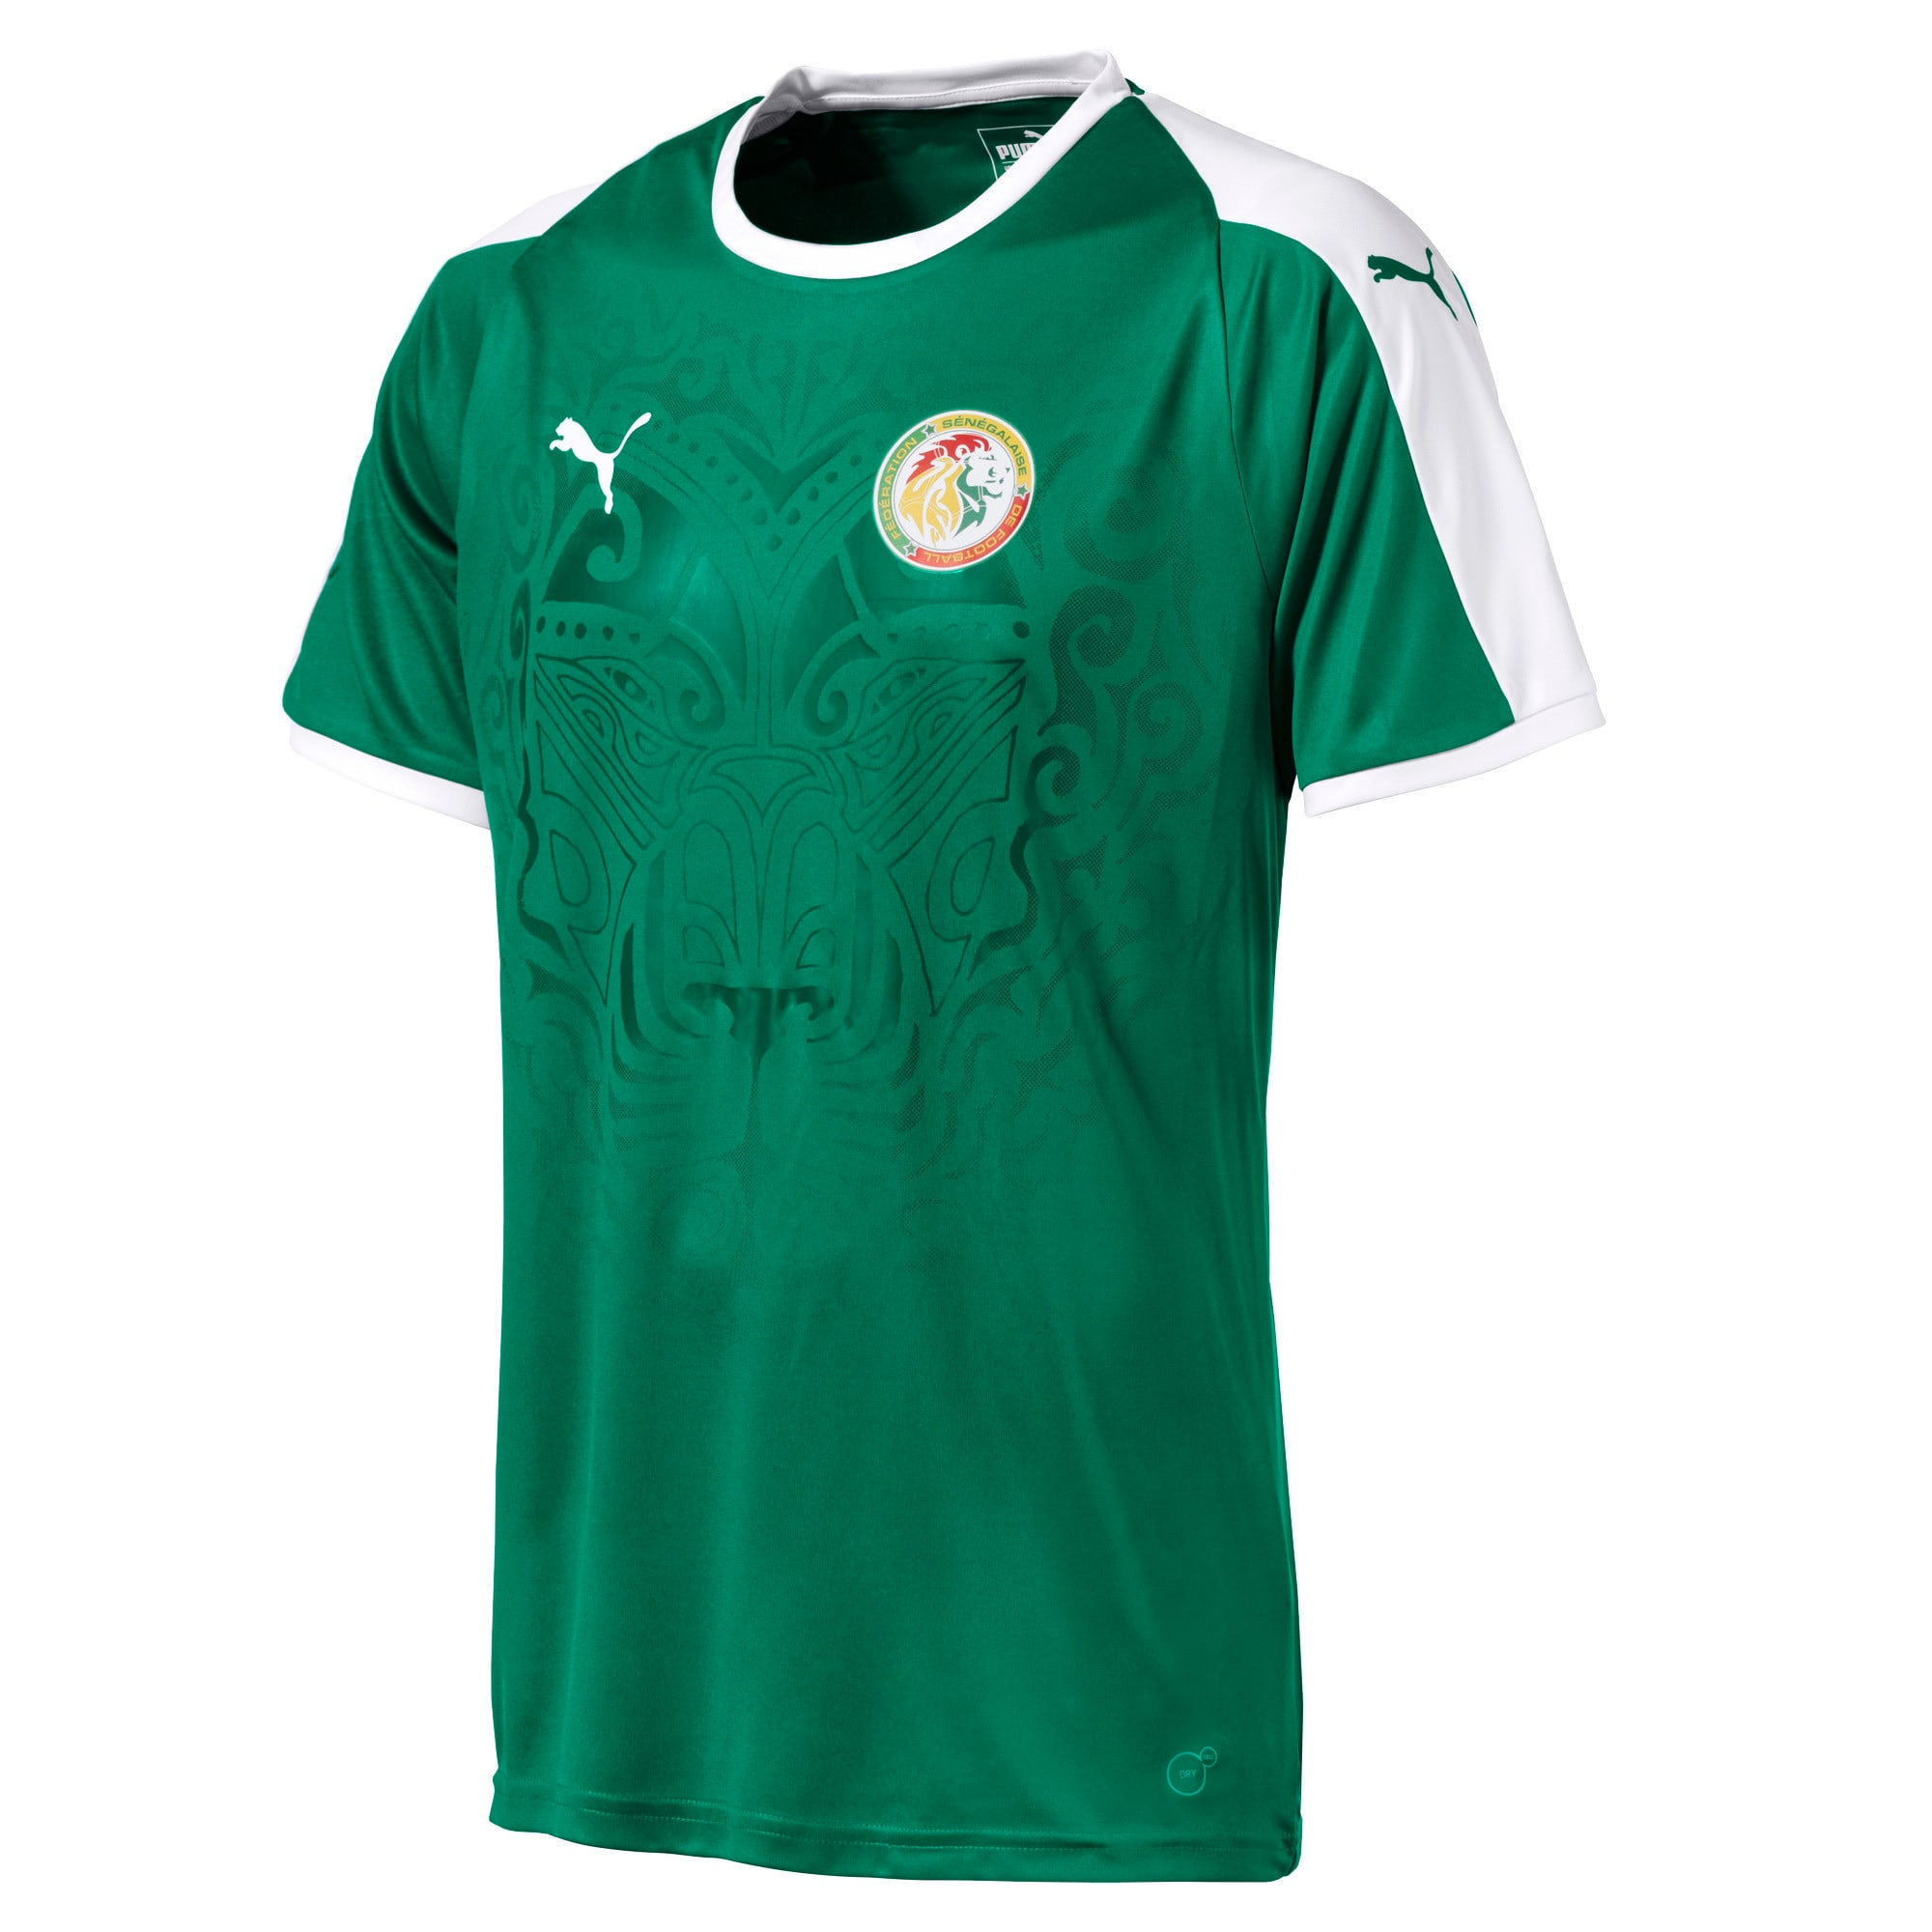 Thumbnail 1 of Senegal Men's Away Replica Jersey, Pepper Green-Puma White, medium